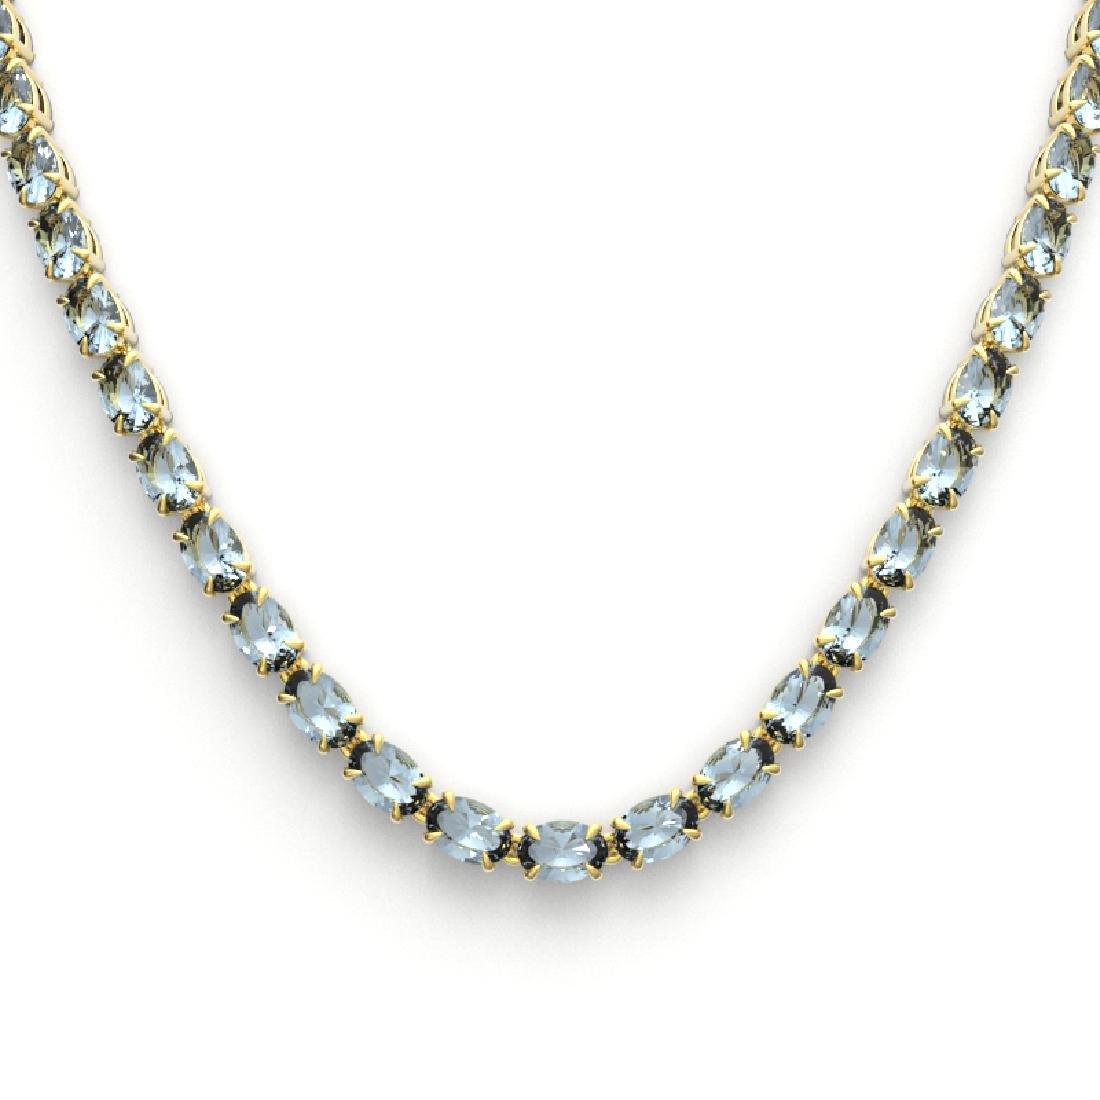 29 CTW Aquamarine Eternity Tennis Necklace 14K Yellow - 2